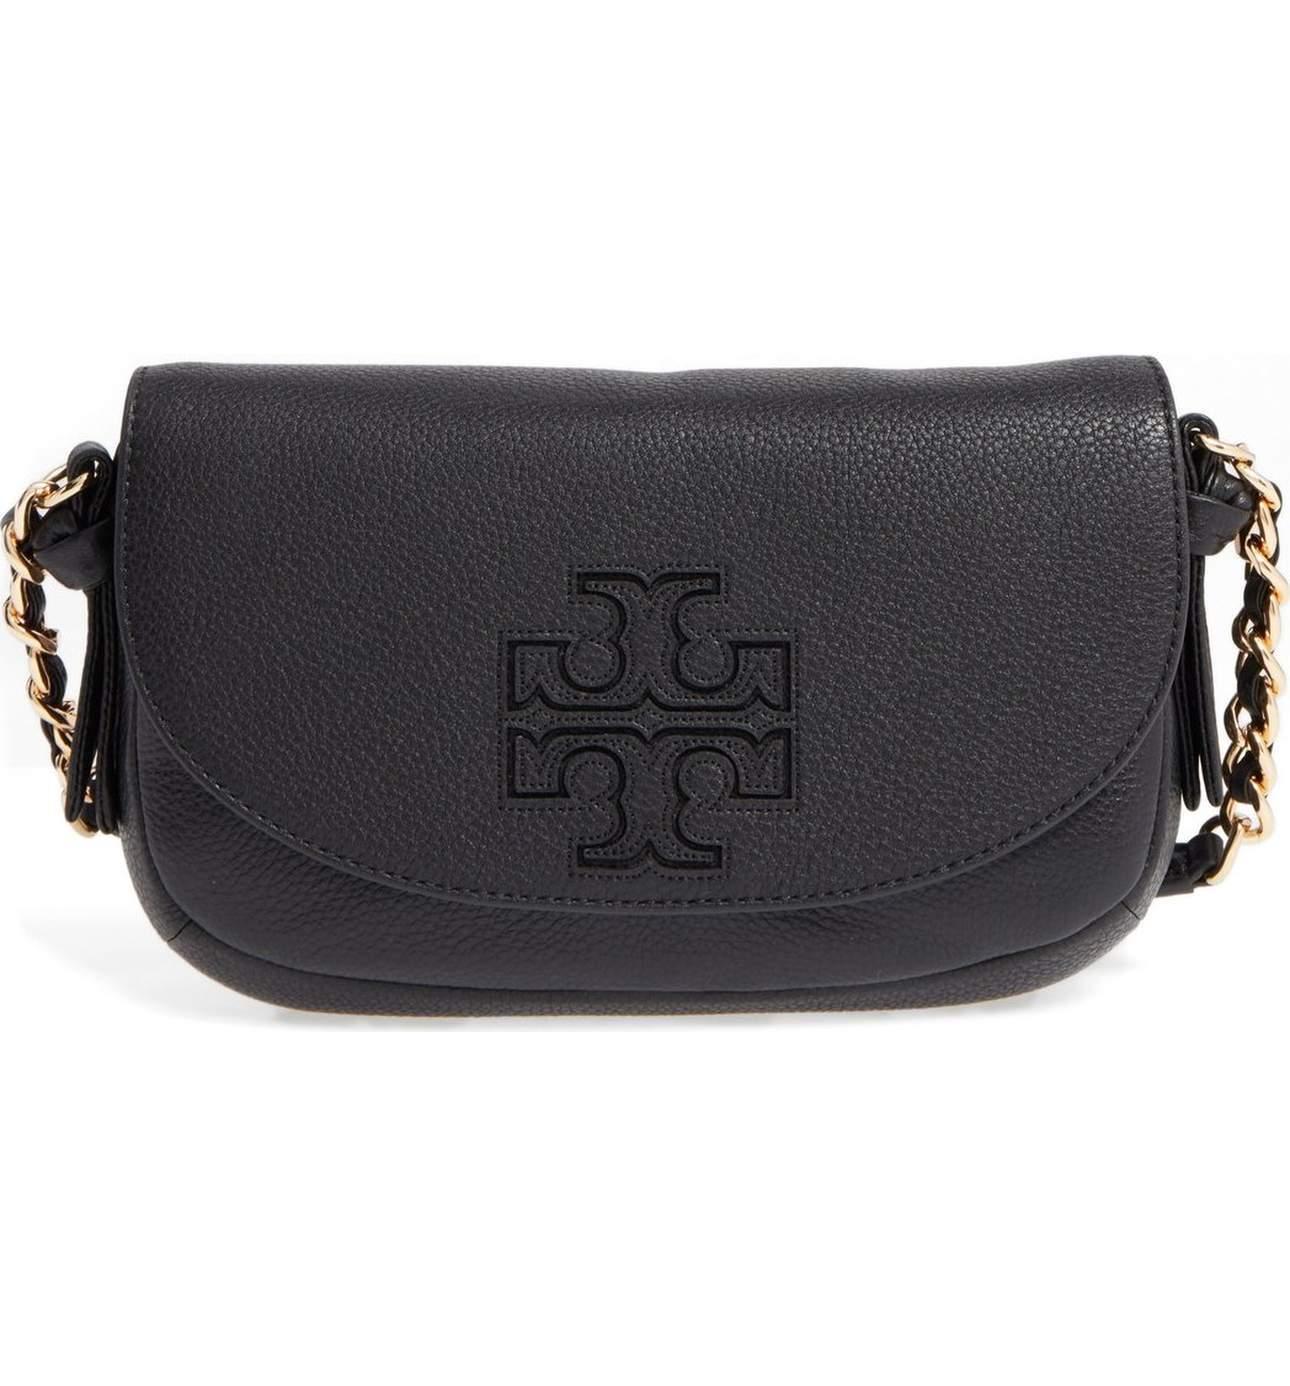 9cd108352125 Tory Burch Harper Mini Cross Body Bag and 50 similar items. 12